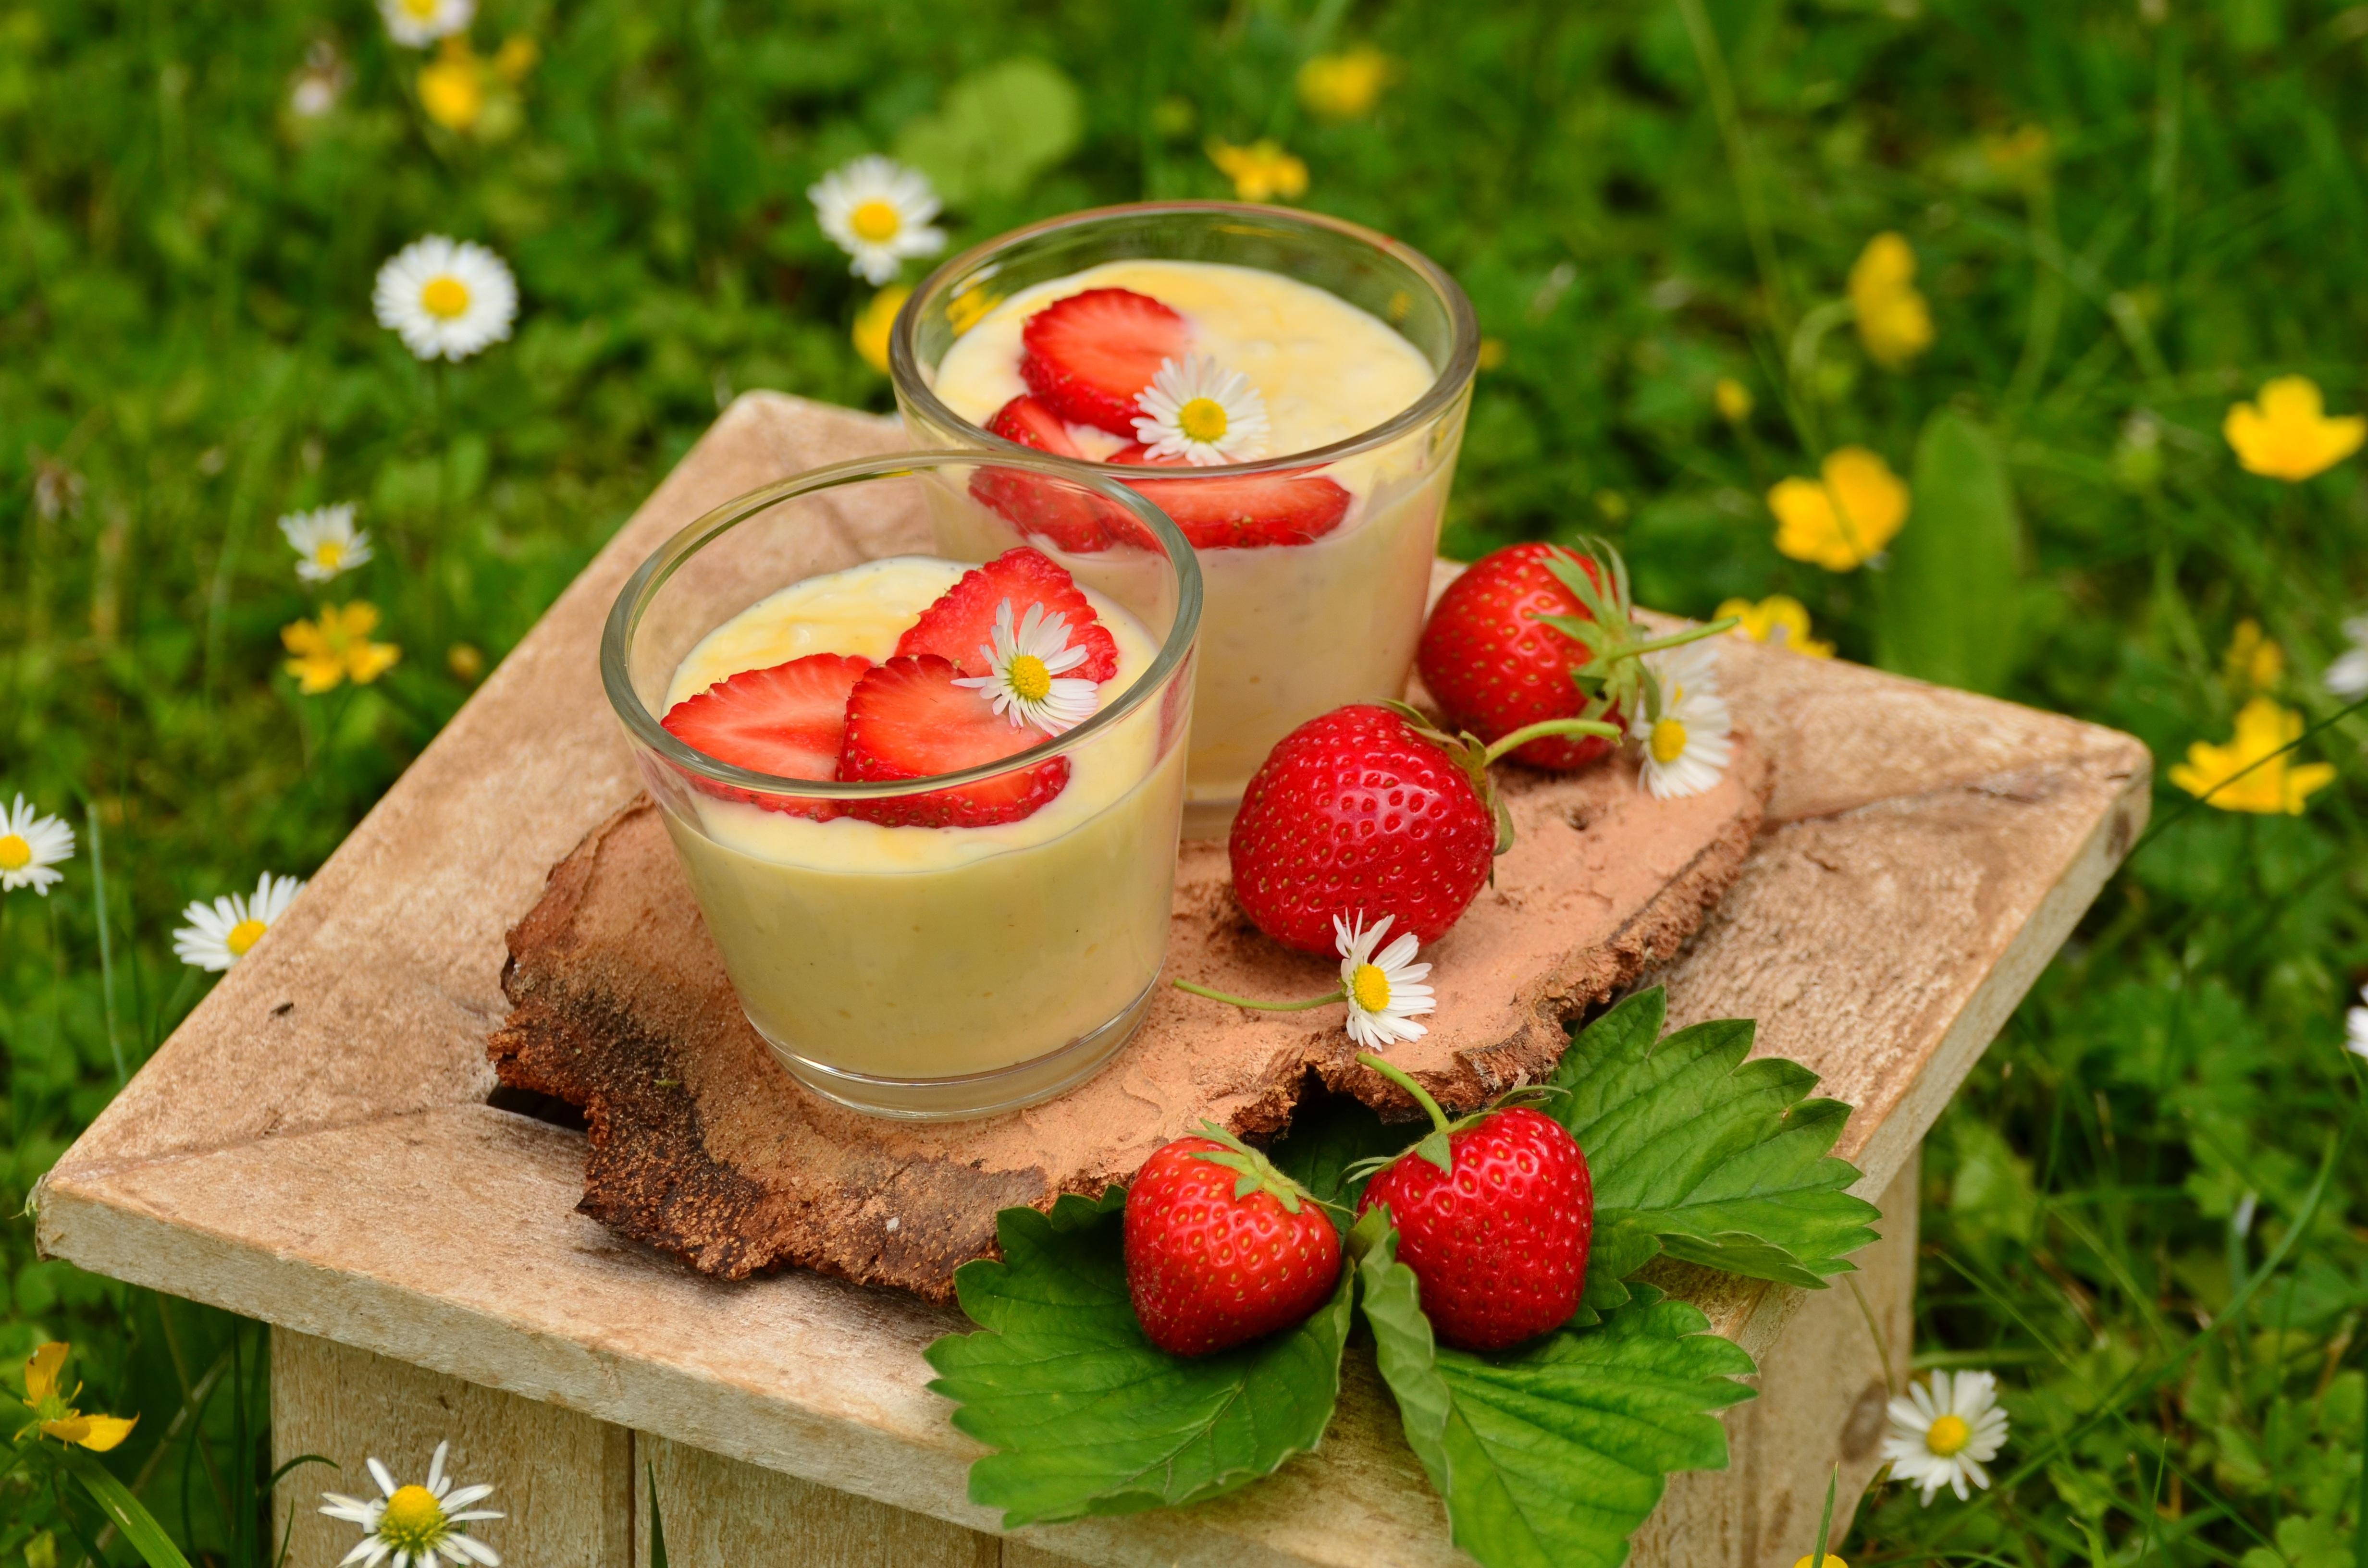 99478 download wallpaper Flowers, Food, Strawberry, Berries, Yogurt, Yoghurt screensavers and pictures for free